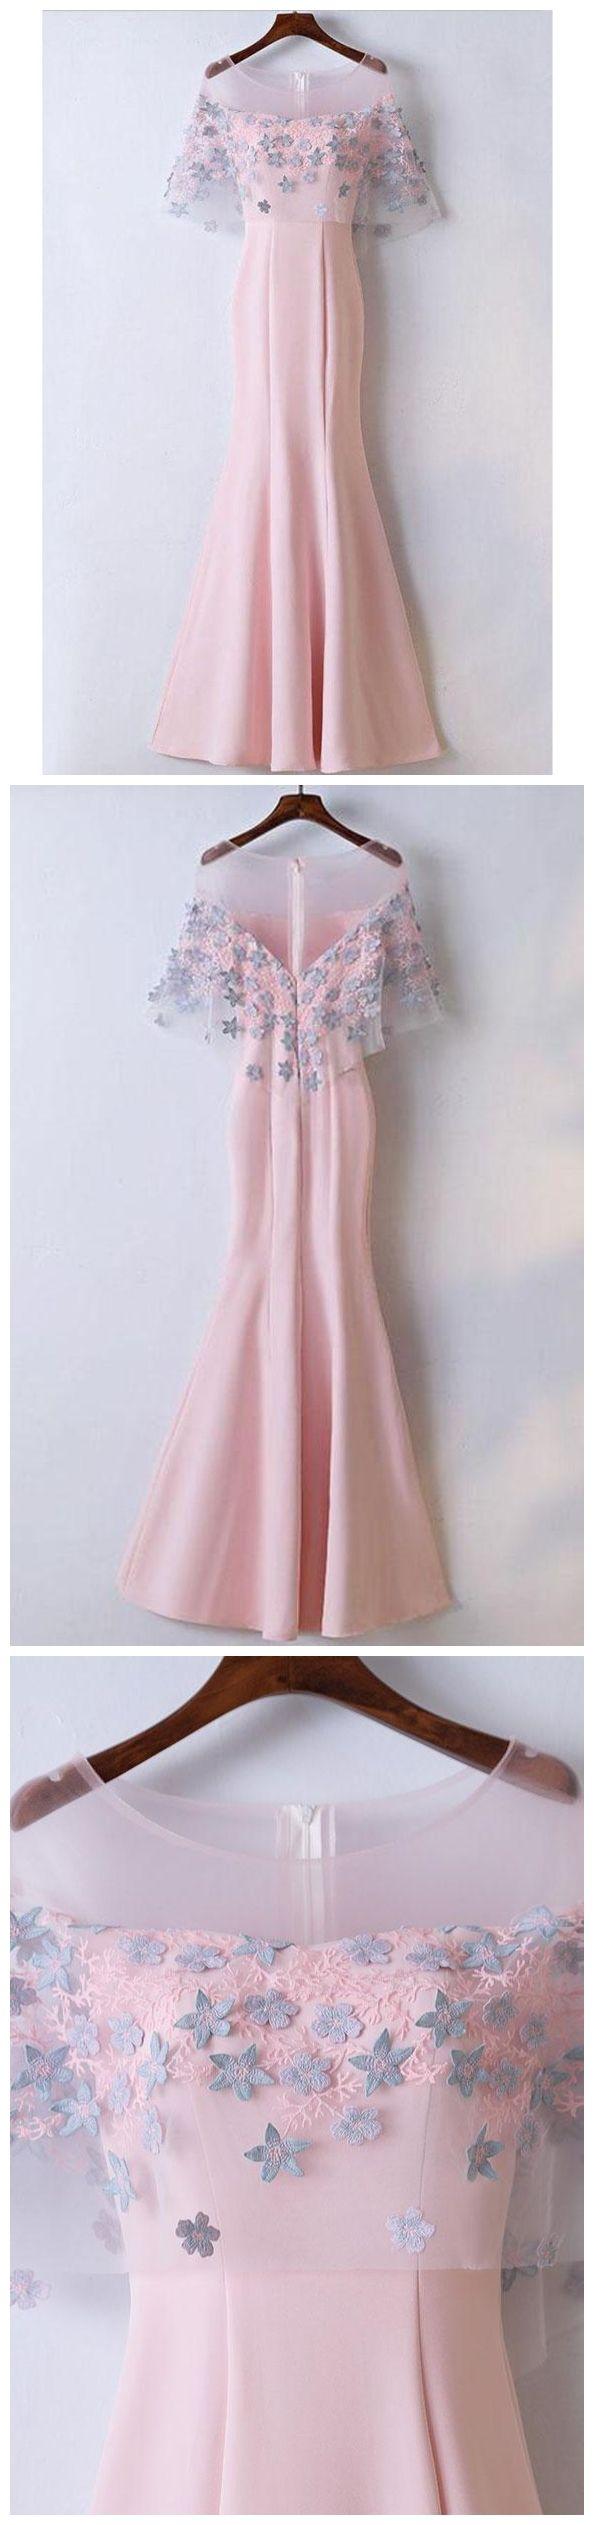 Pink womenus elegant formal dresses see through mermaid prom dresses